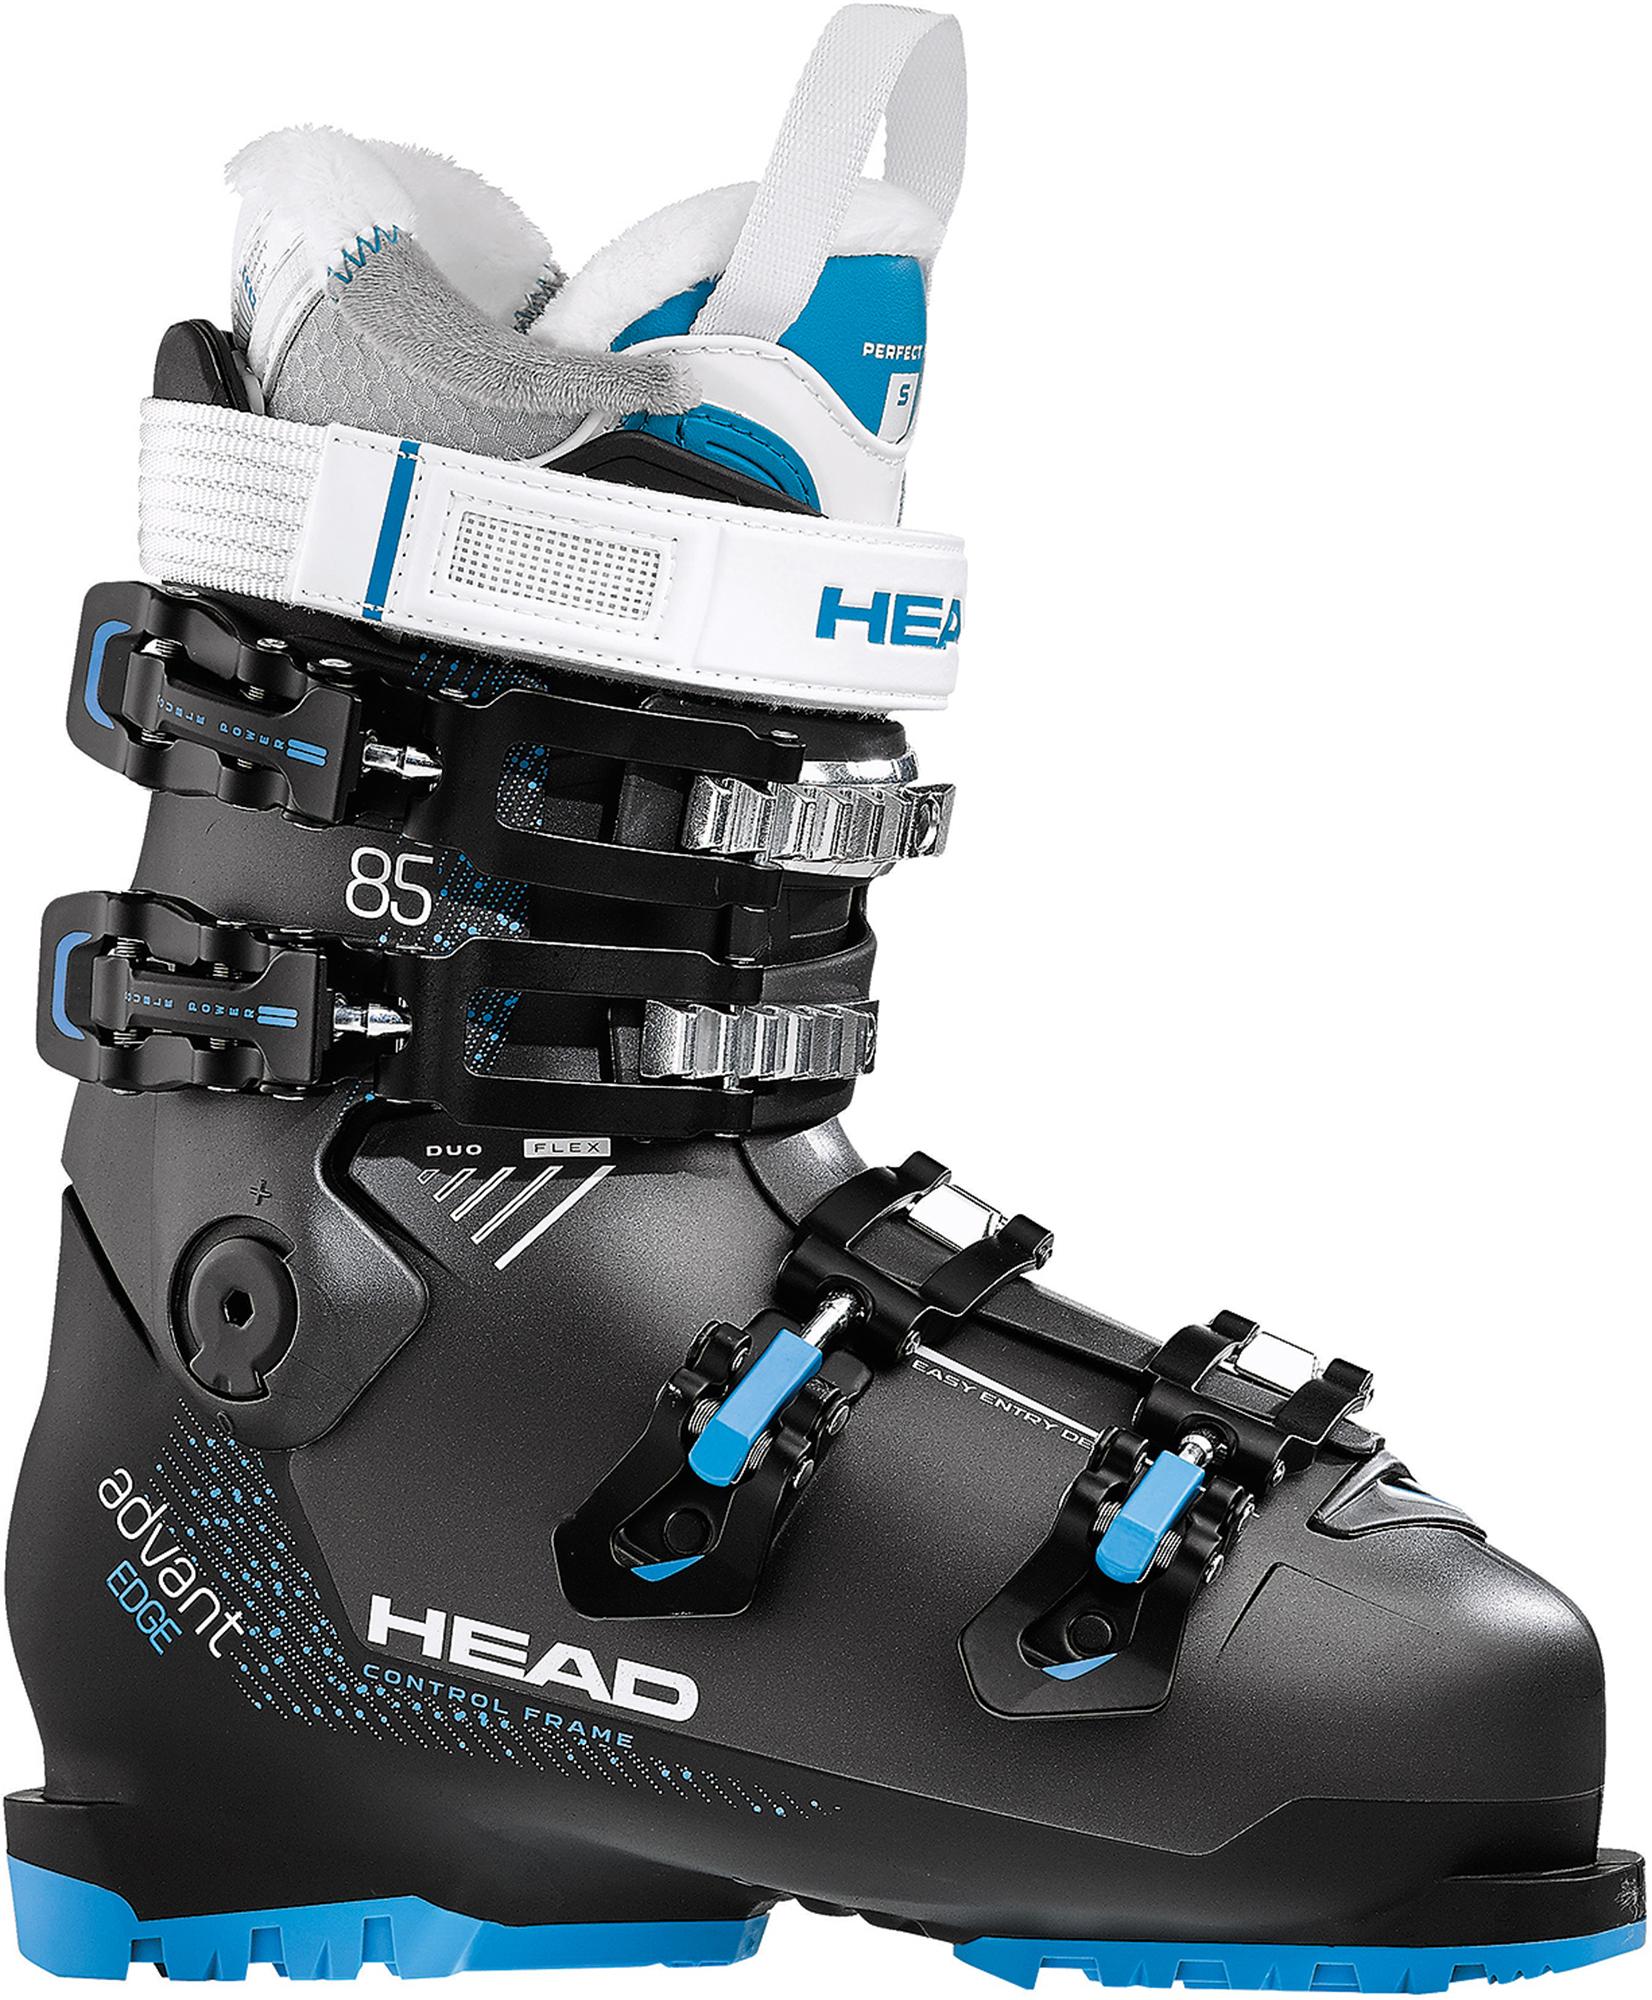 Head Ботинки горнолыжные женские Advant Edge 85 W, размер 40